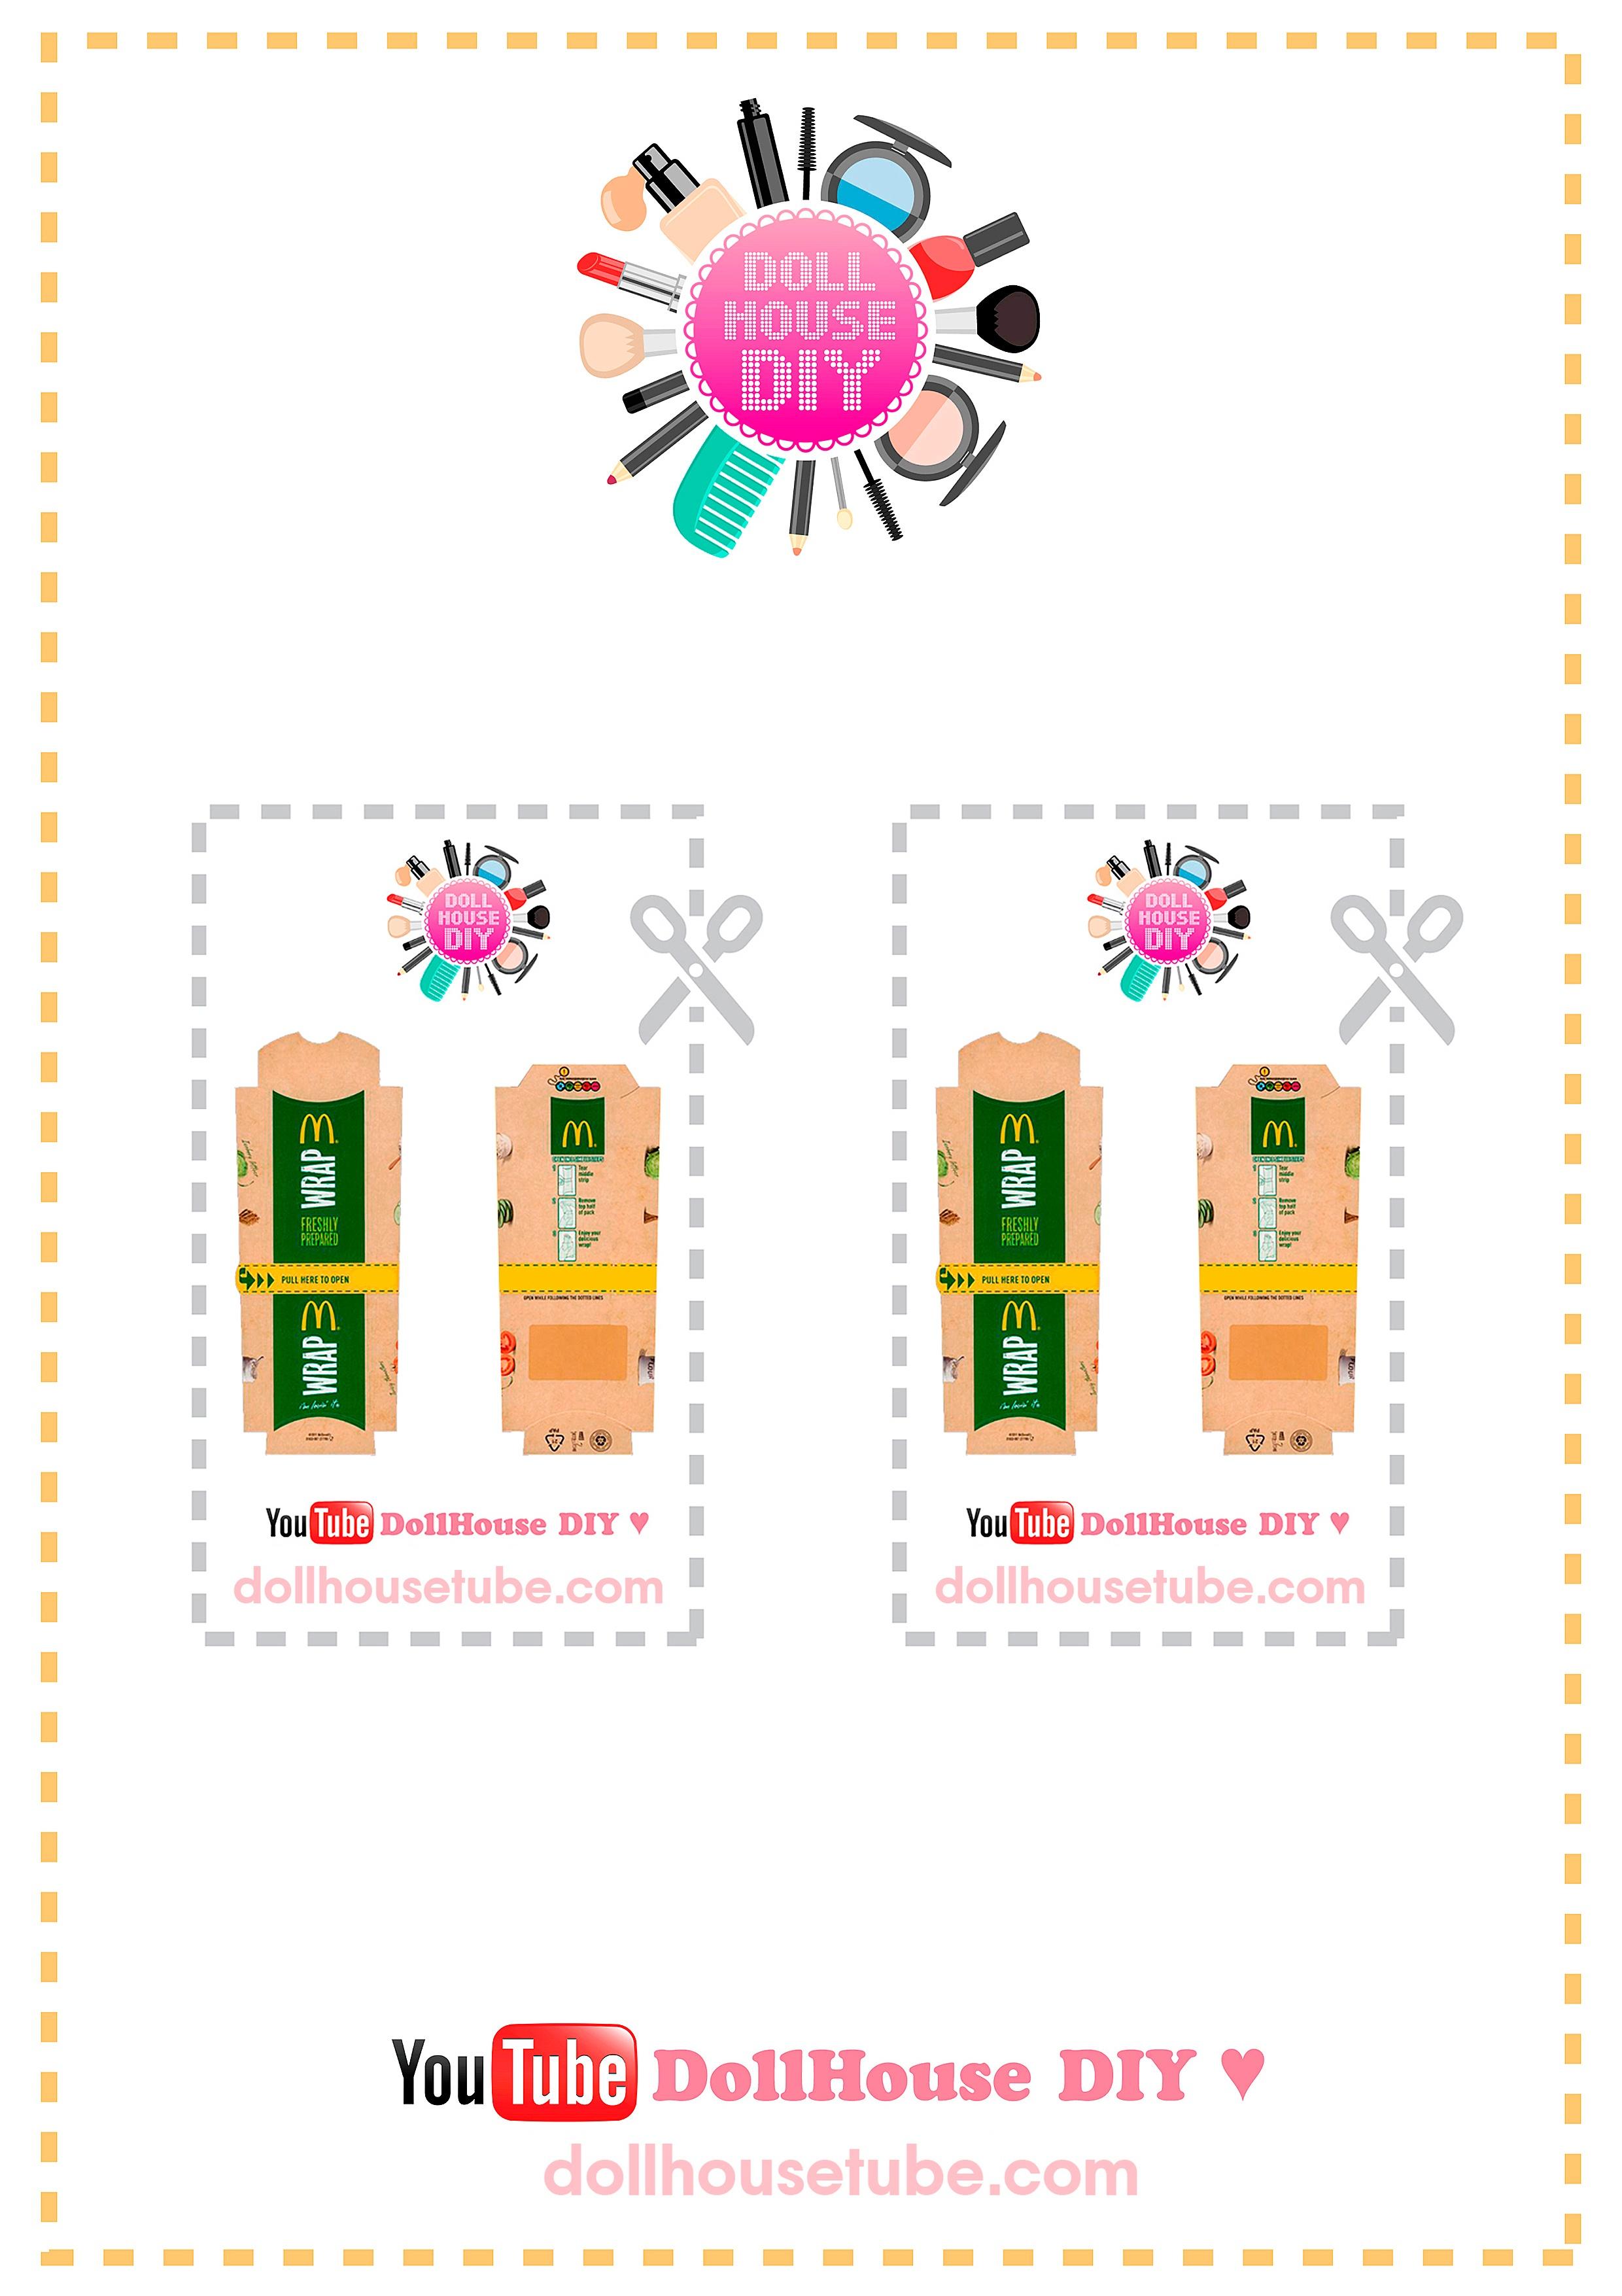 Miniature Printables – Dollhouse Diy ♥ - Free Miniature Printables